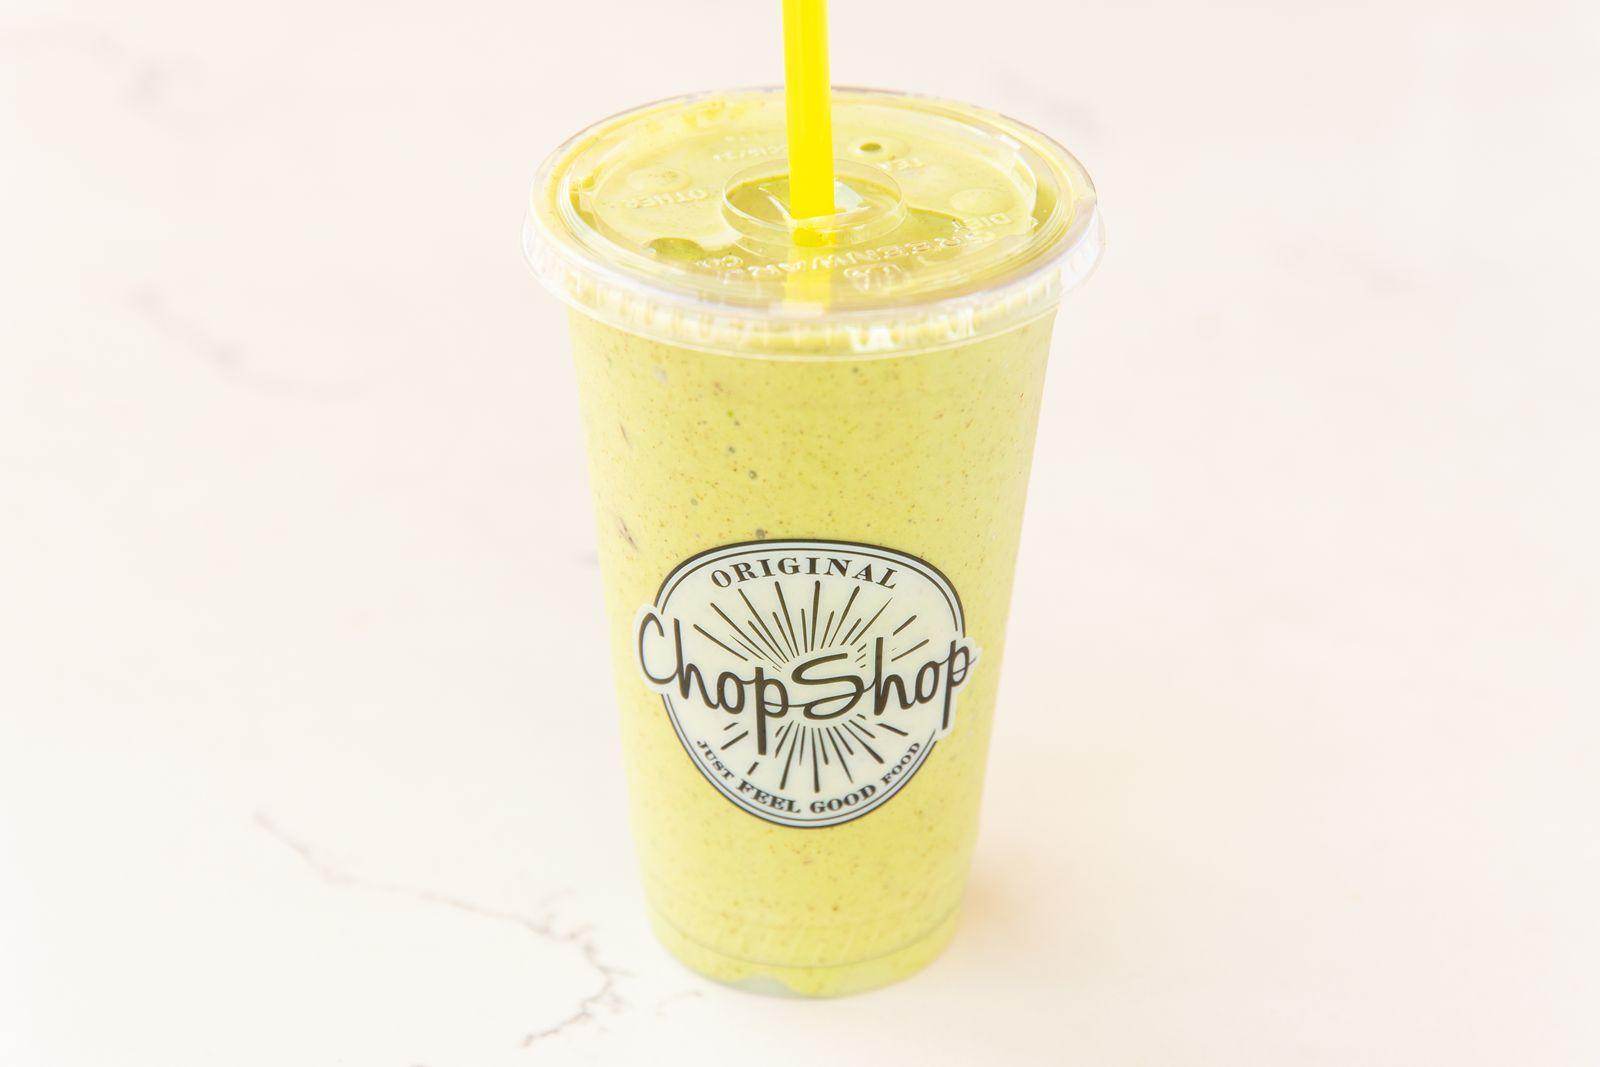 Original ChopShop is Your New Feel Good Breakfast Destination